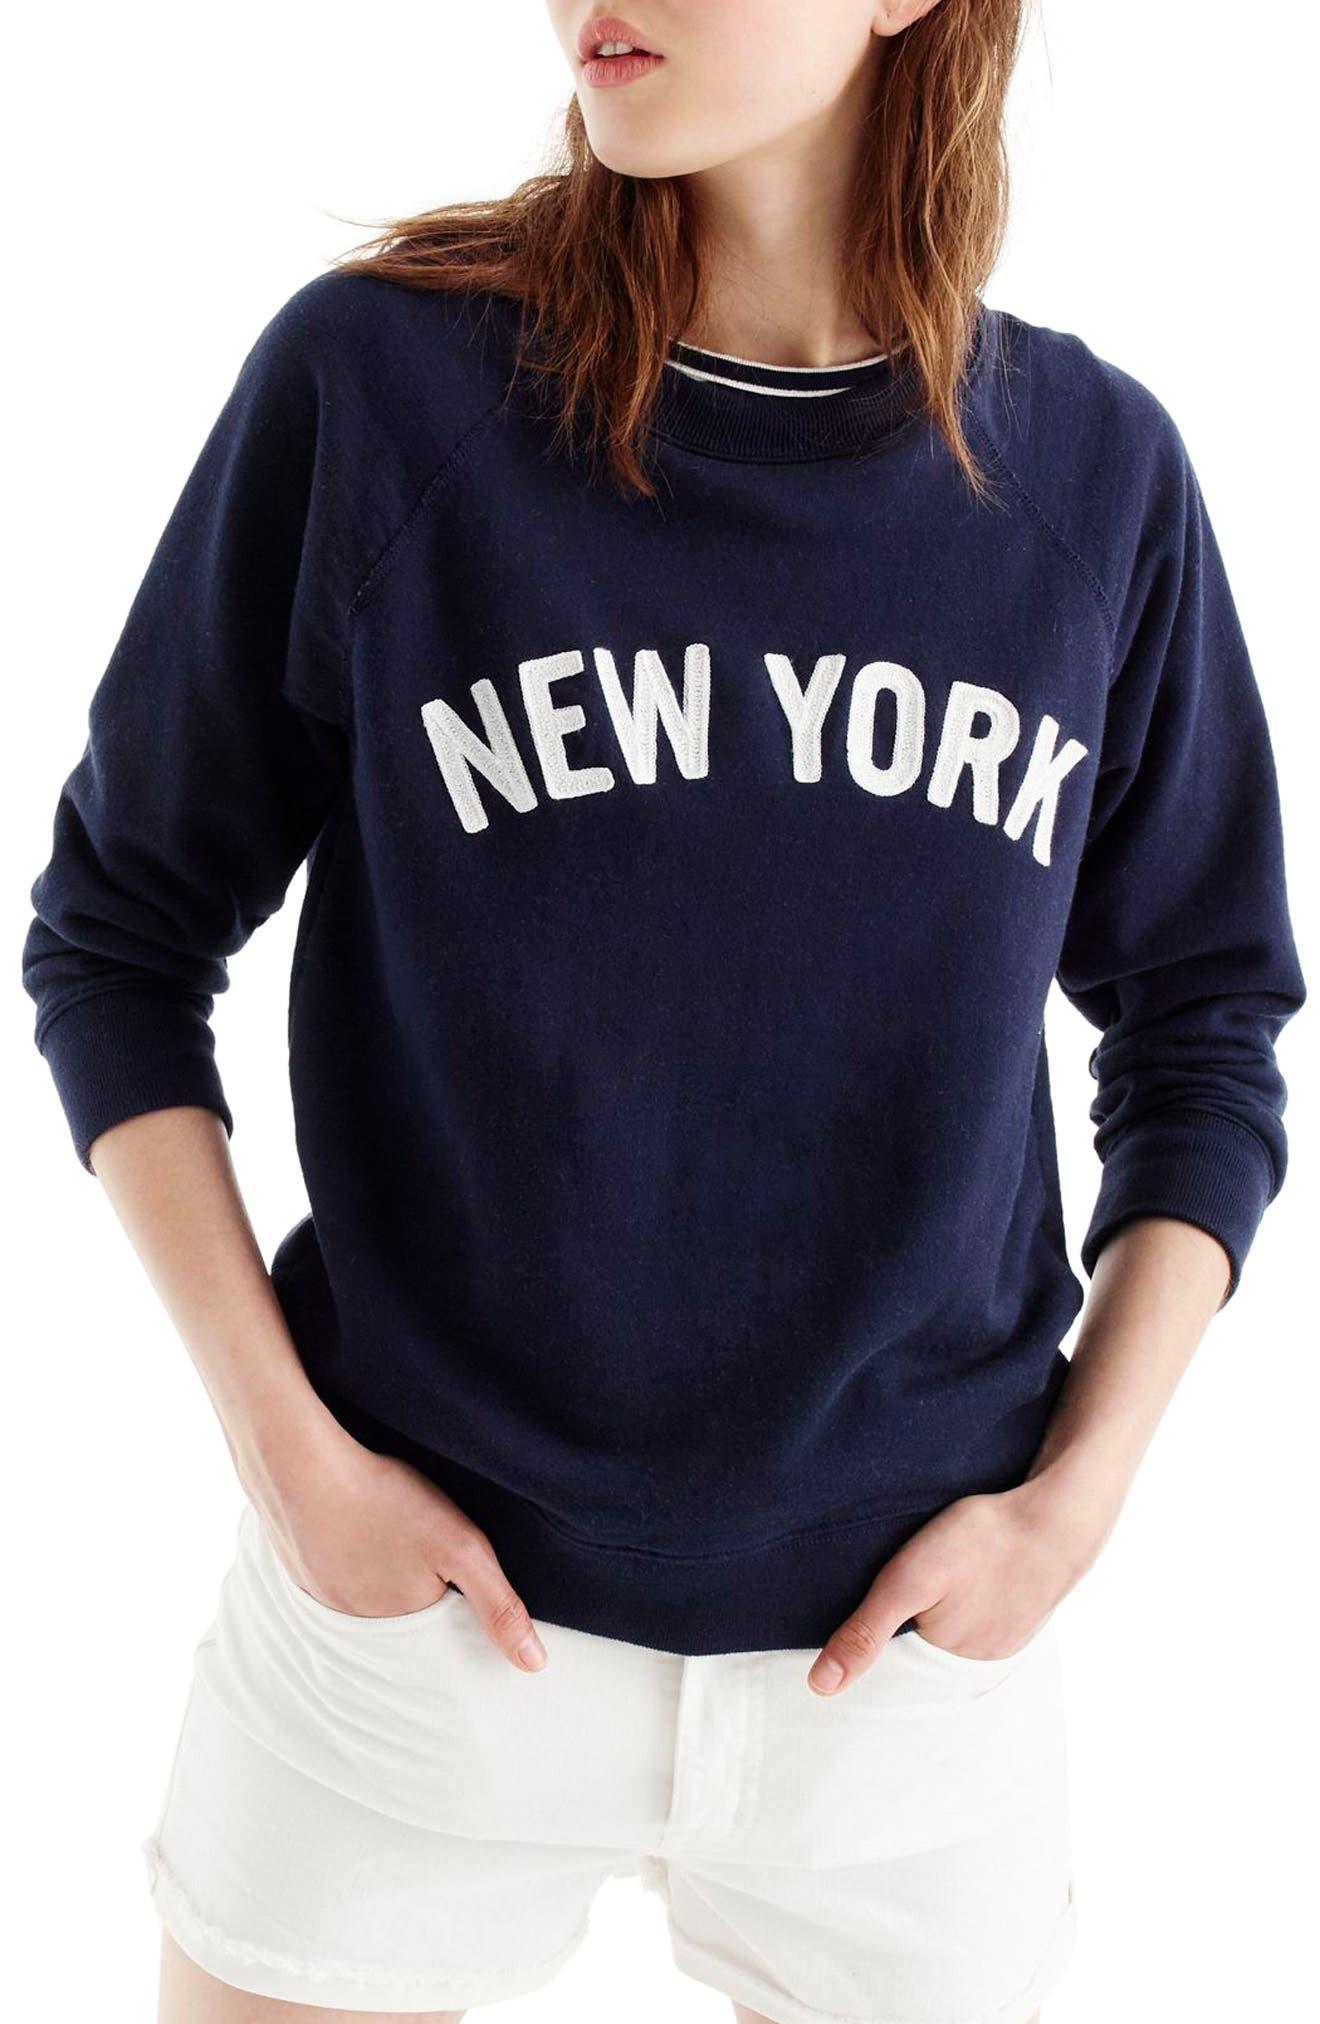 New York Sweatshirt,                             Main thumbnail 1, color,                             400